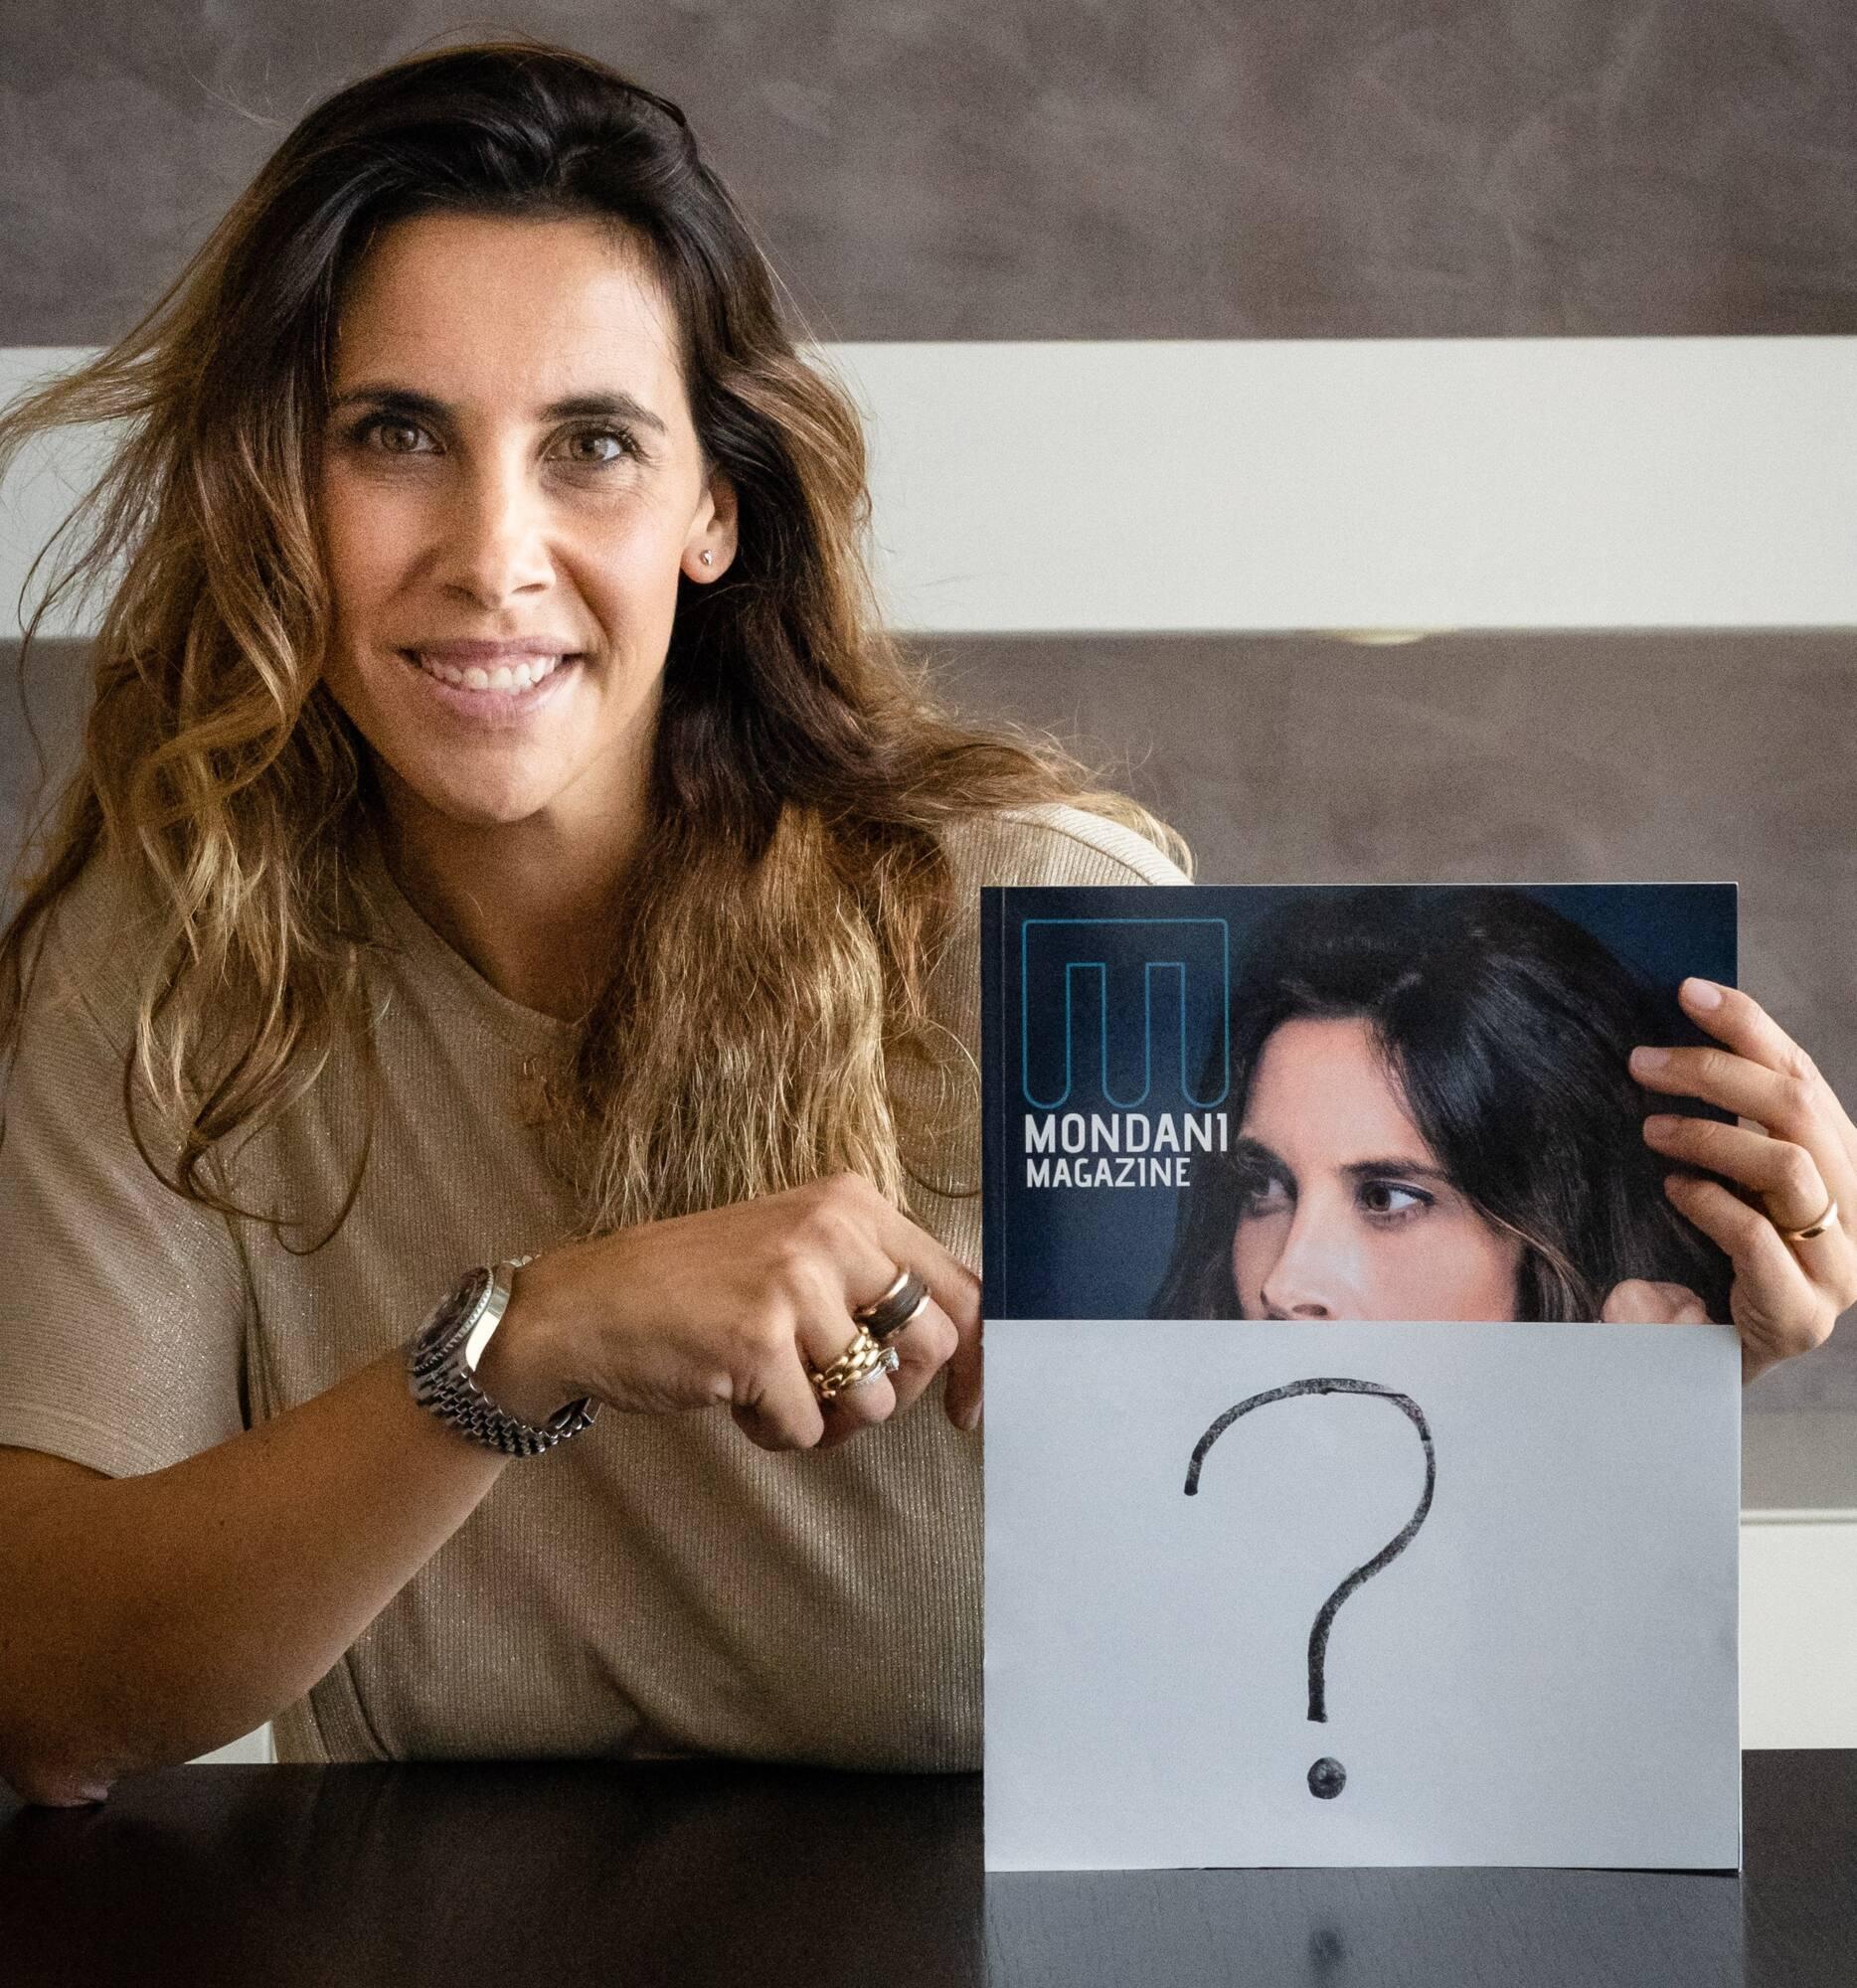 Would you like to appear in the Mondani Magazine? - MondaniWeb